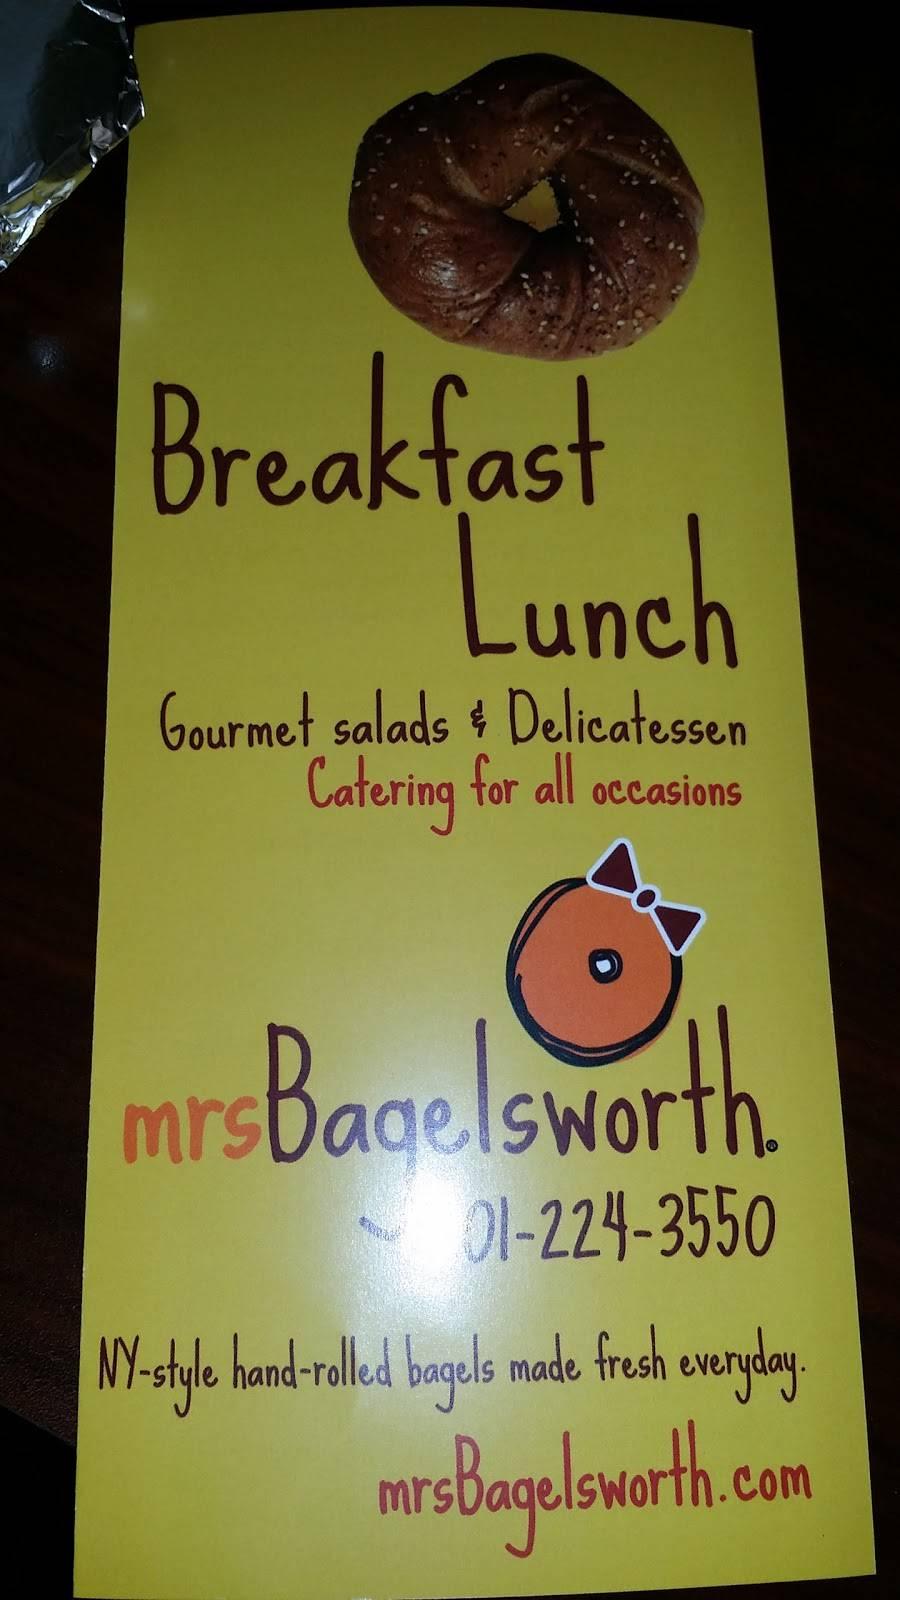 Mrs. Bagelsworth   bakery   1209 Anderson Ave, Fort Lee, NJ 07024, USA   2012243550 OR +1 201-224-3550